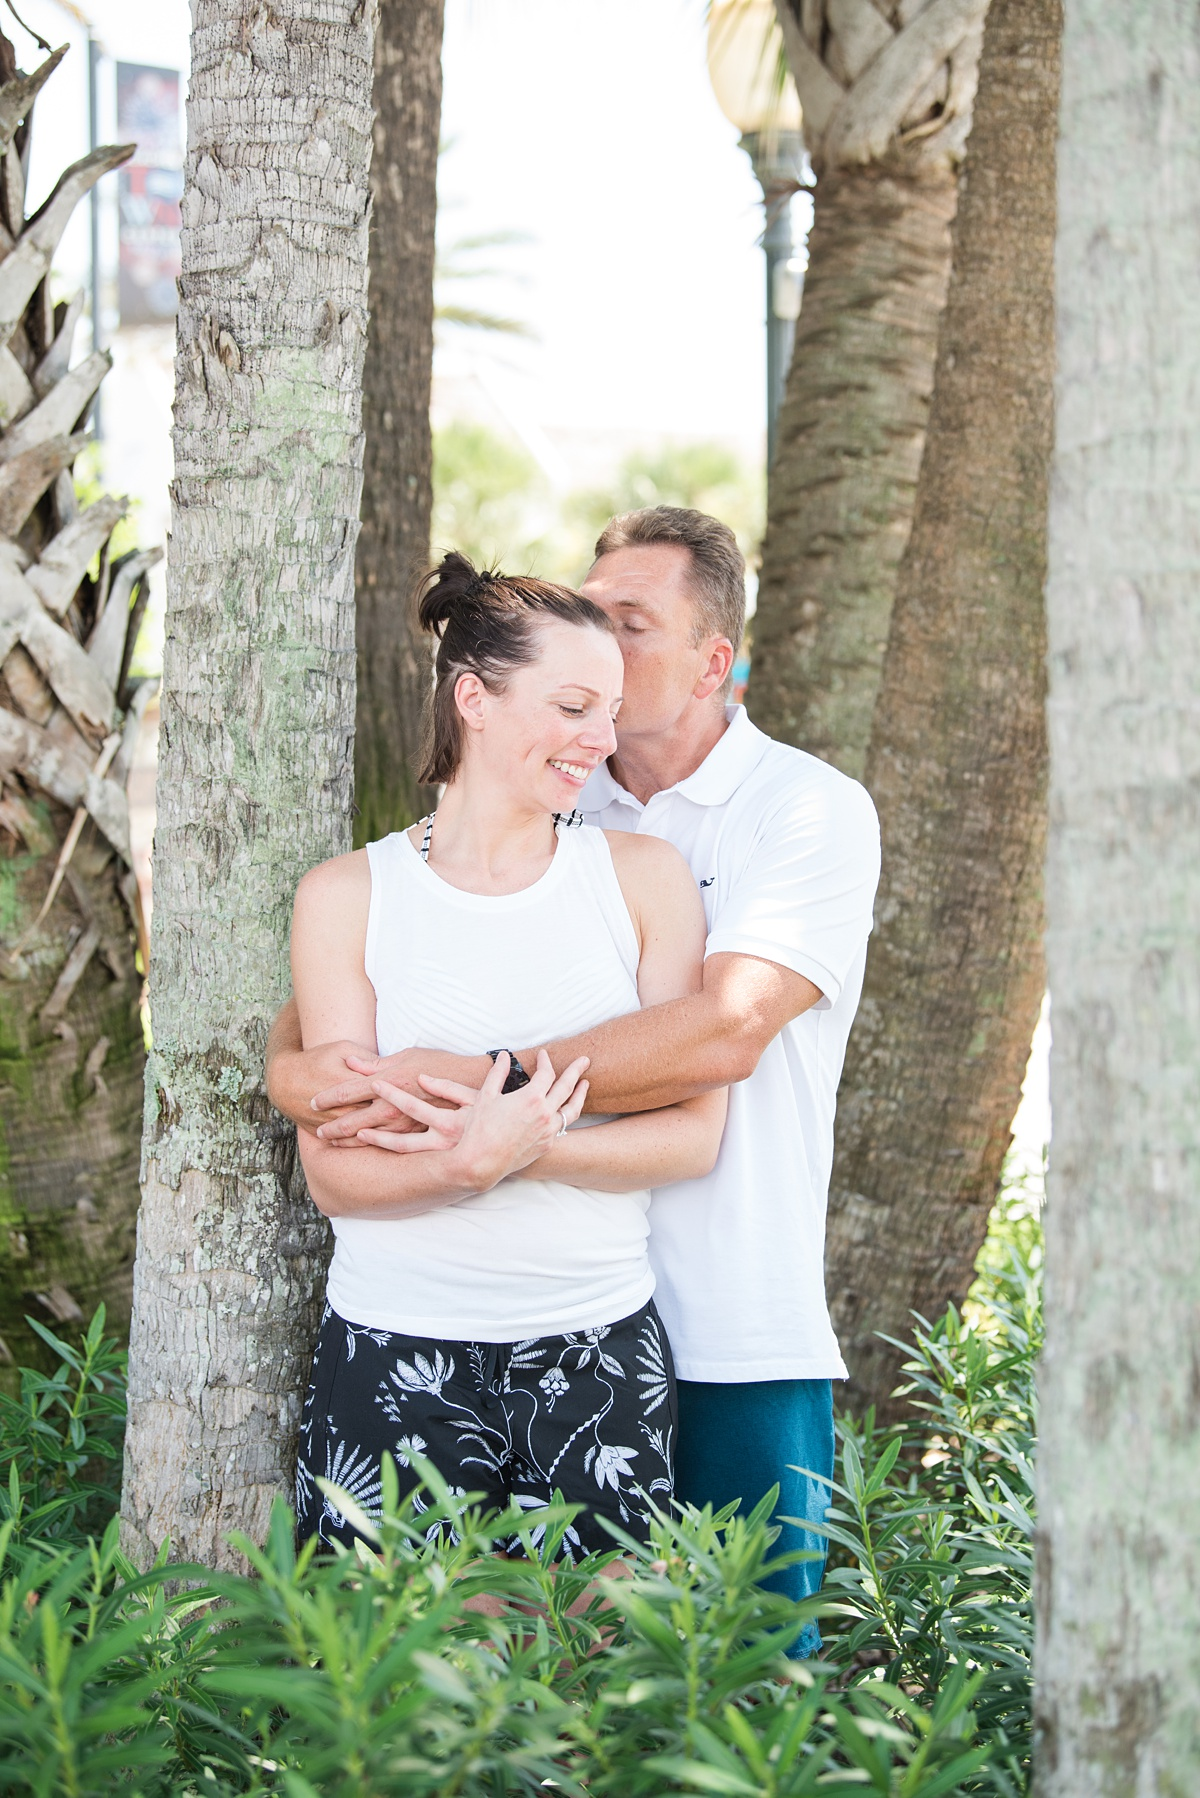 Atlantic Beach Proposal_Planning a Proposal_Jacksonville Florida Wedding Photographer_Engagement Portraits_2.jpg